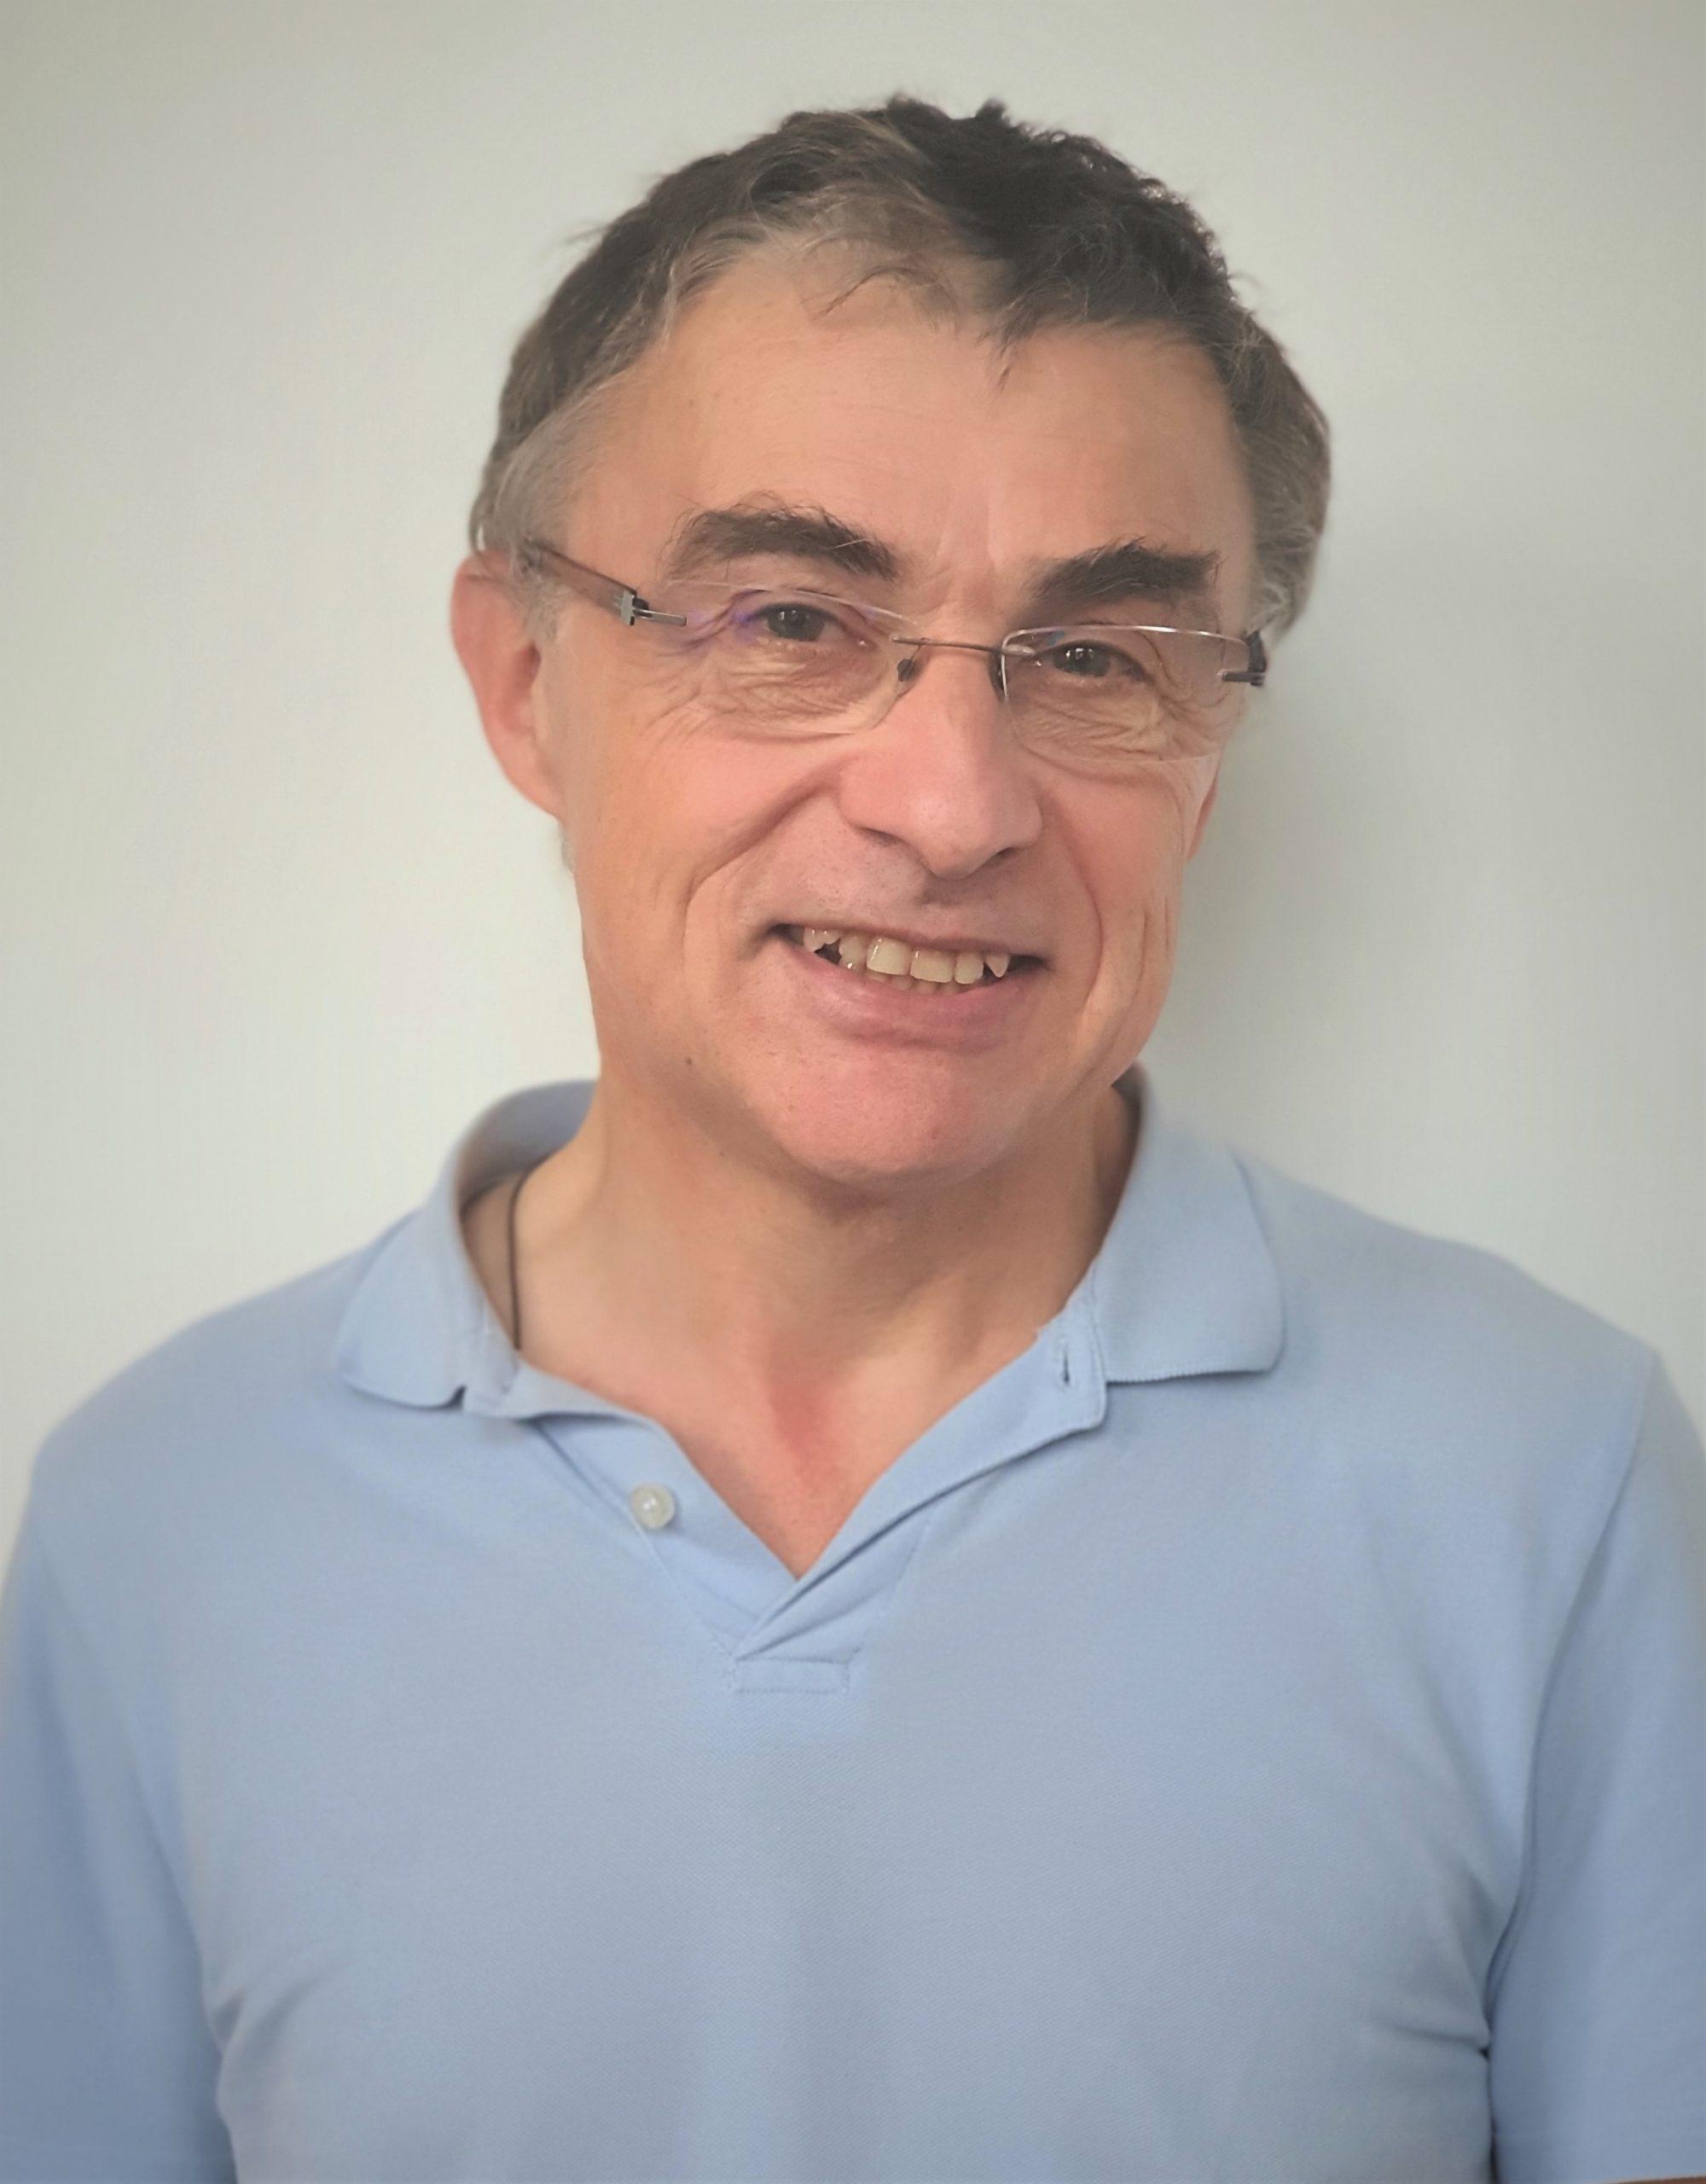 Appel - membre CA - BRODIN Jean-Paul